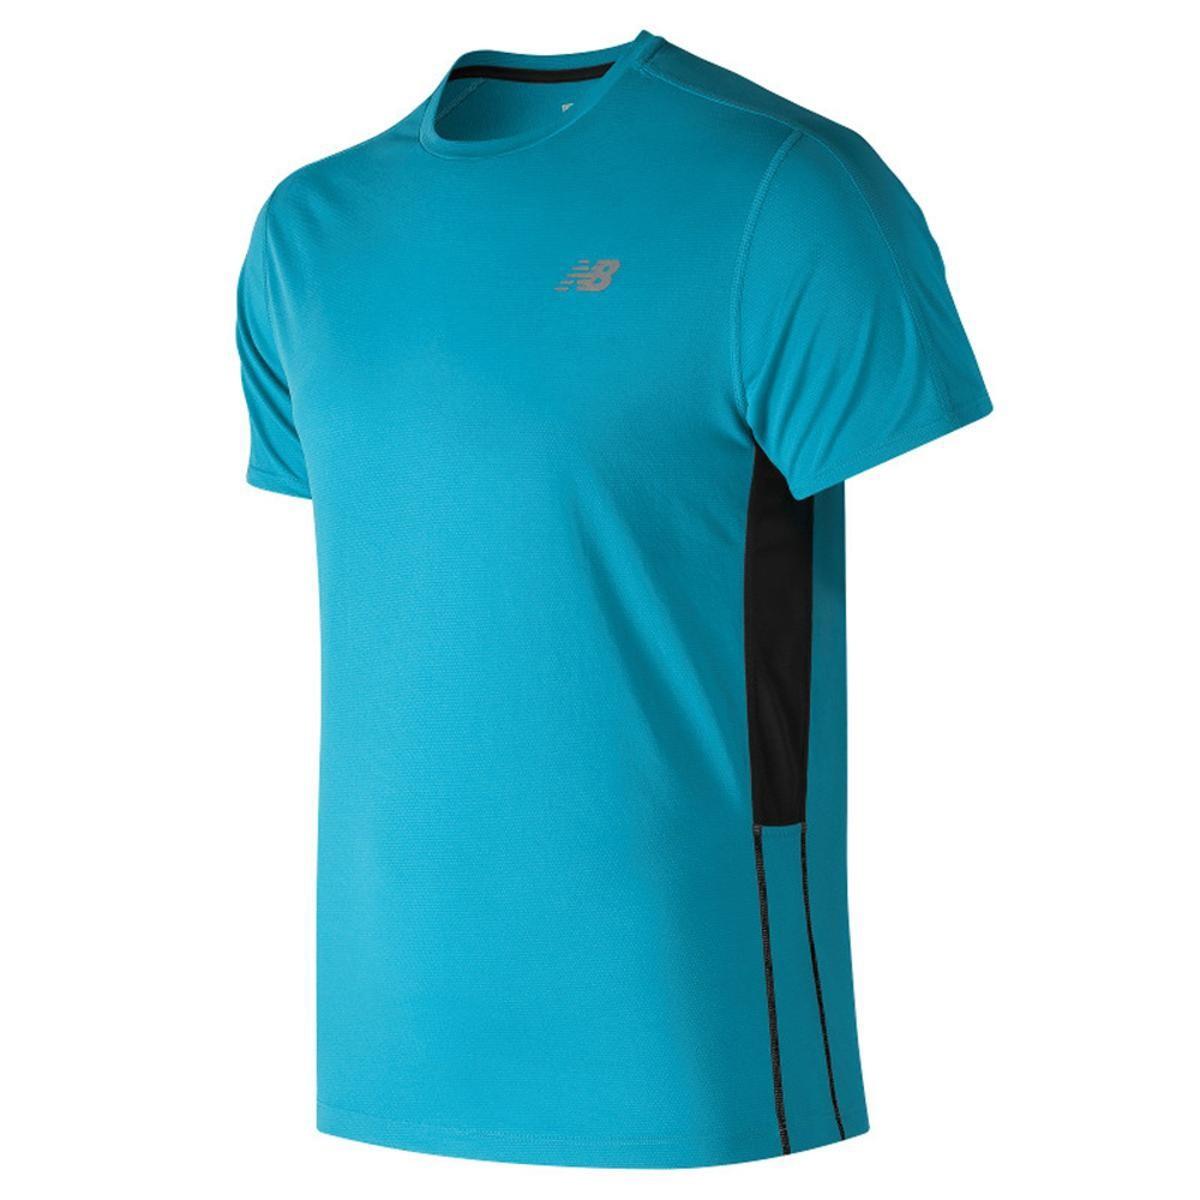 Camiseta New Balance Accelerate - Azul Claro - Masculino